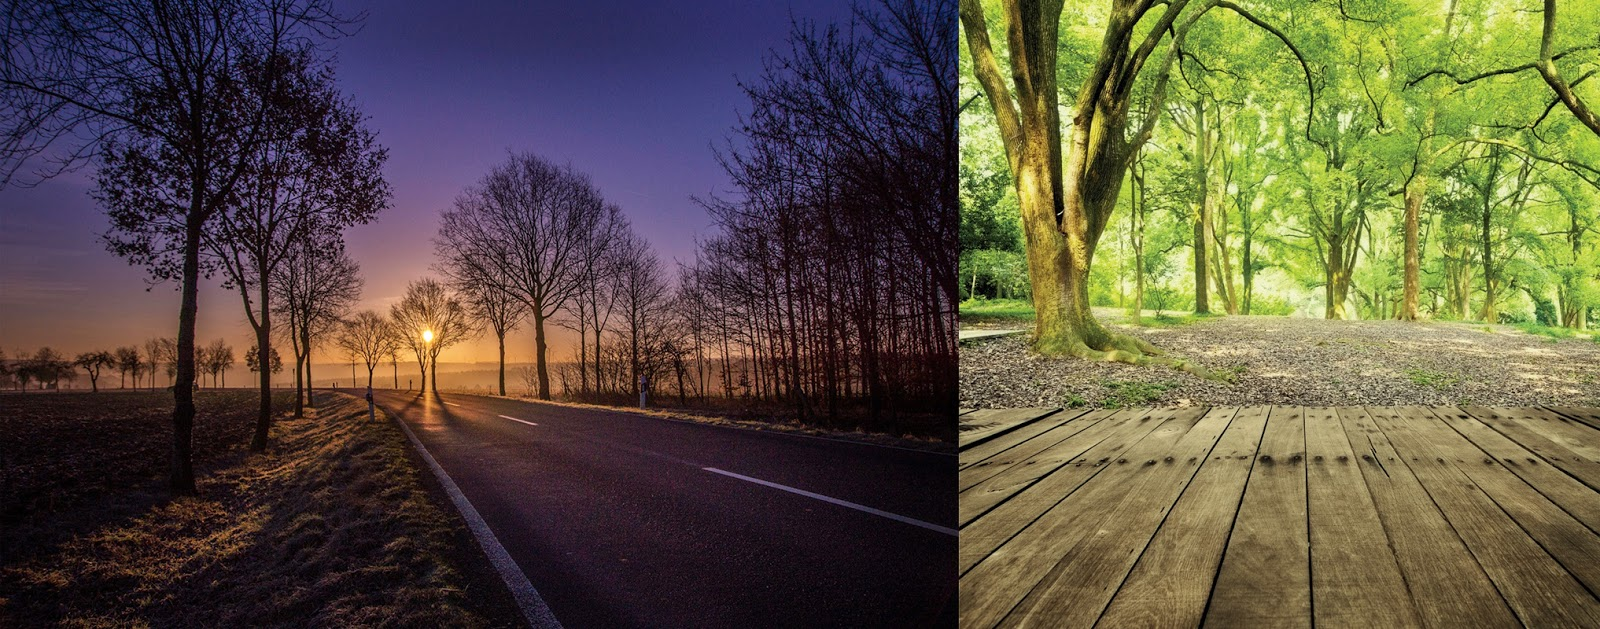 memaksimlakan Komposisi Foto Landscape